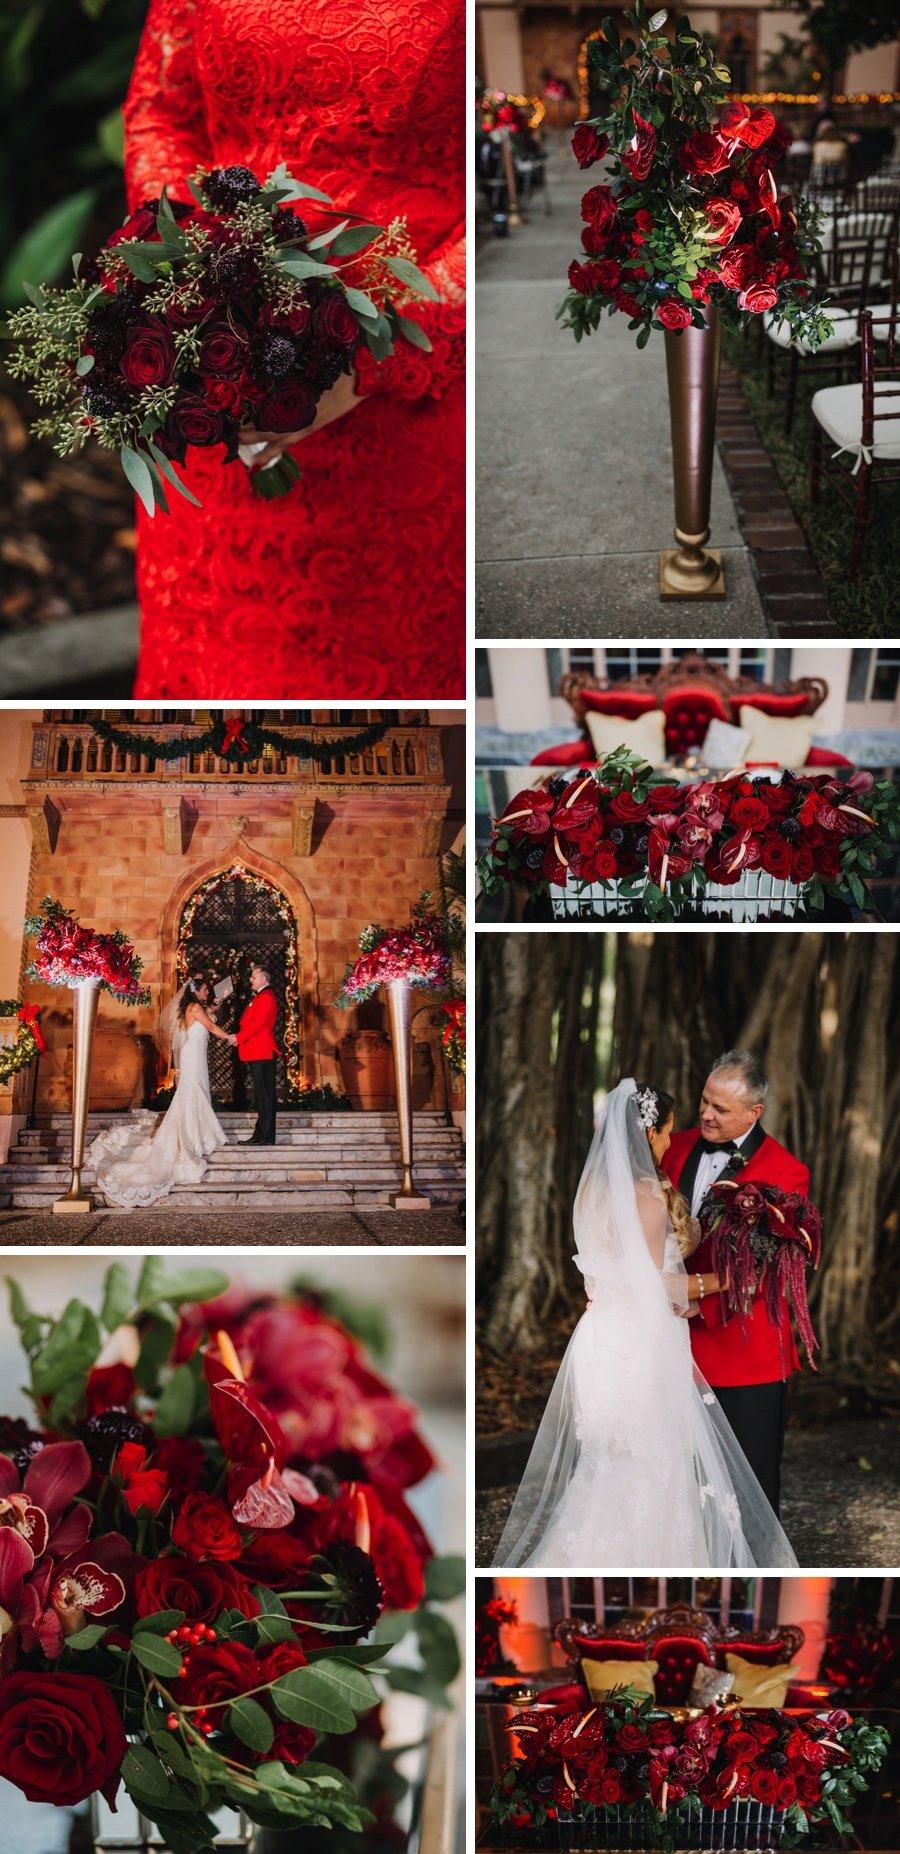 Real wedding: Blue seas and Christmas trees